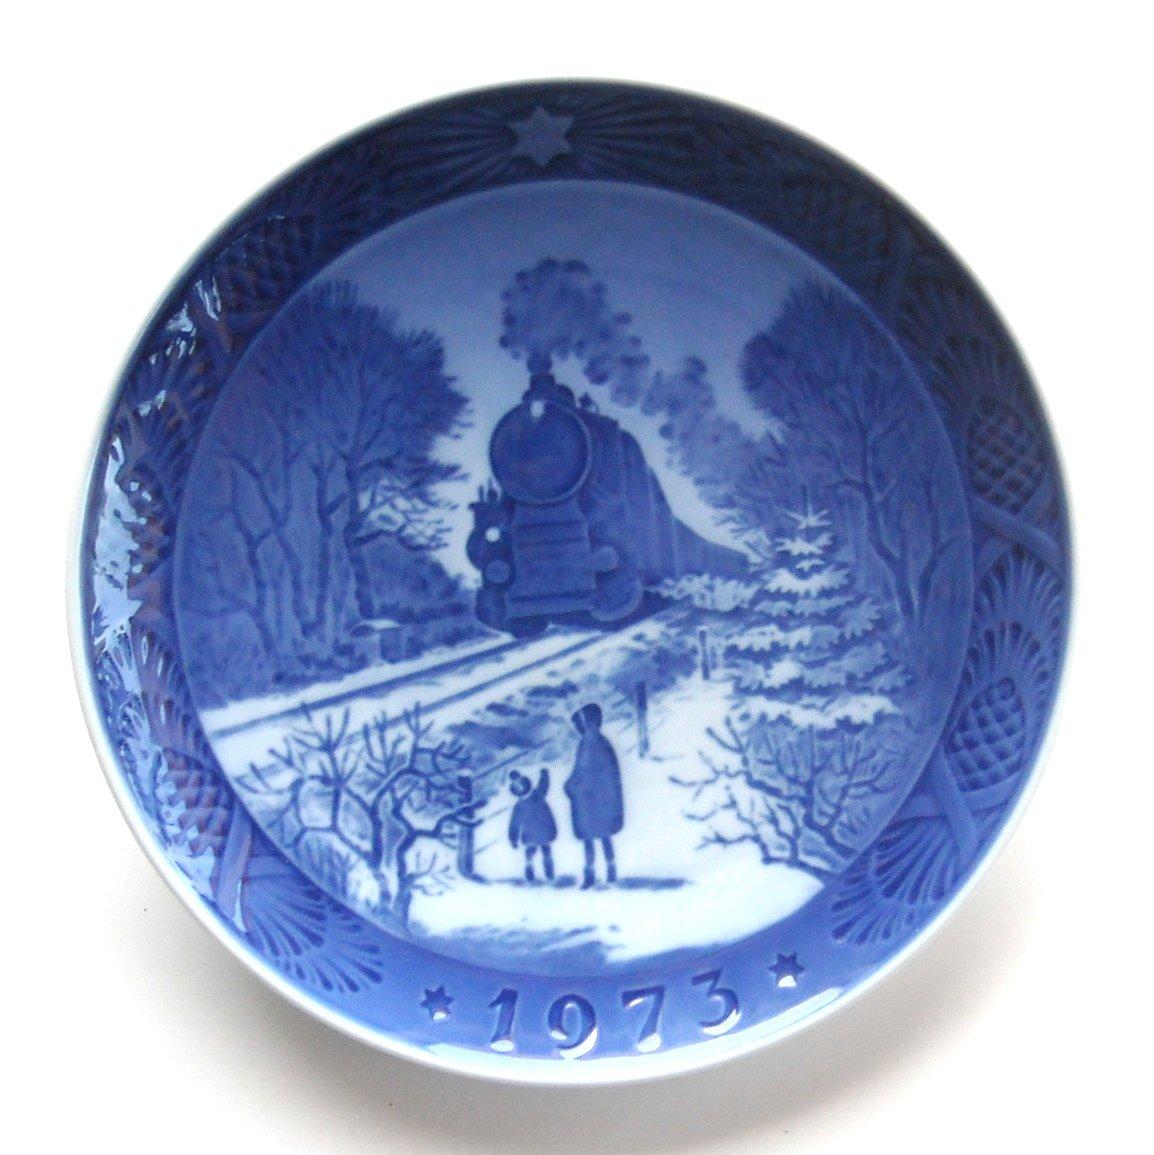 Royal Copenhagen 1973 Christmas Plate